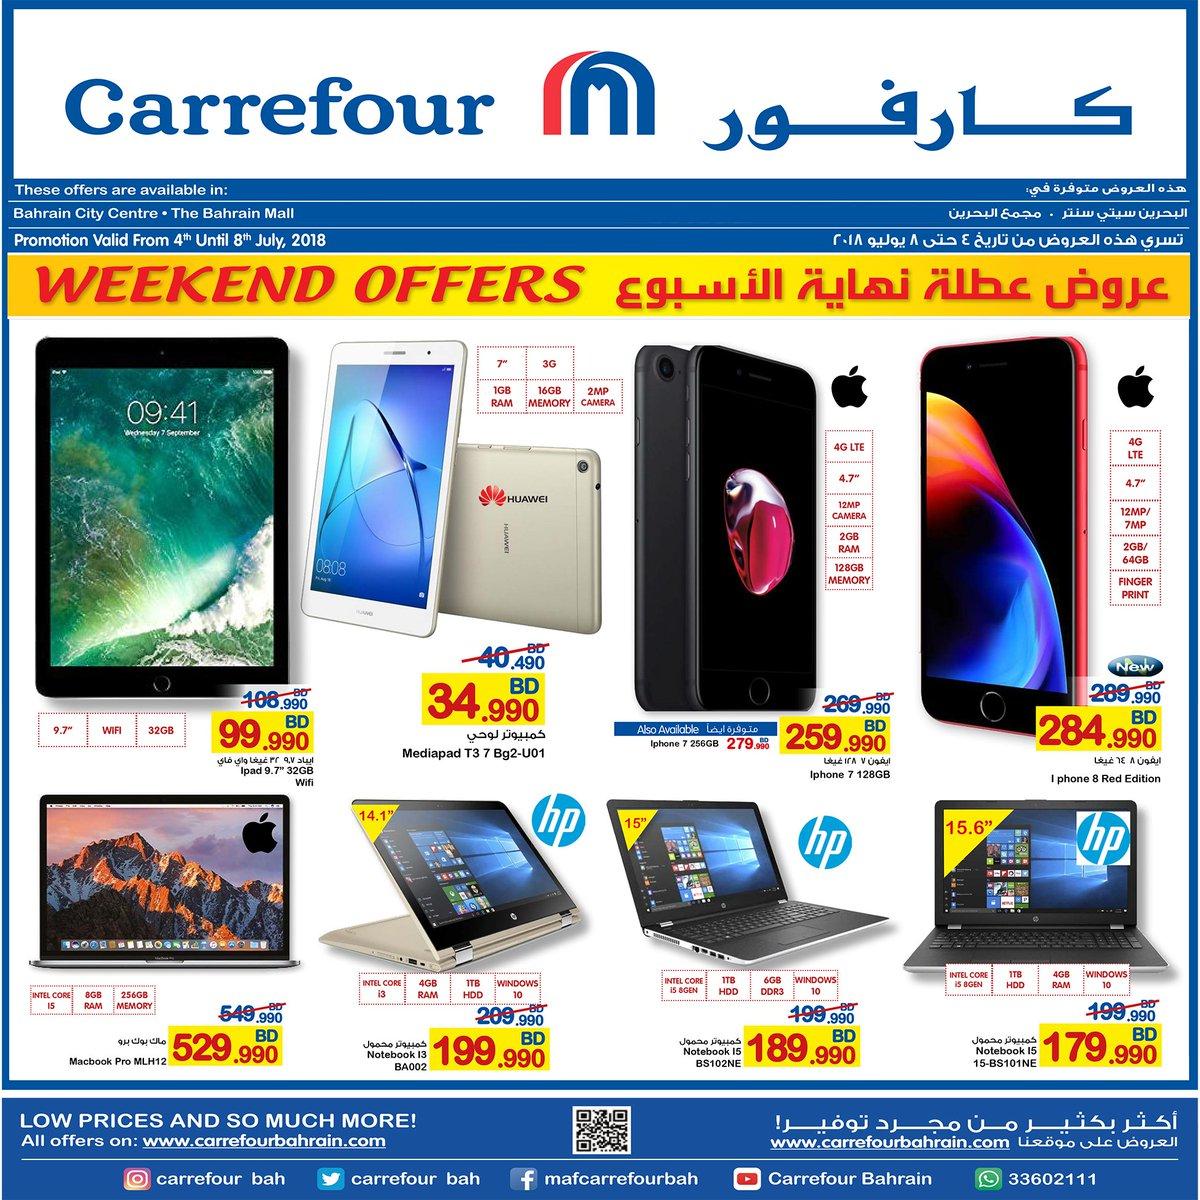 Carrefour Bahrain on Twitter: